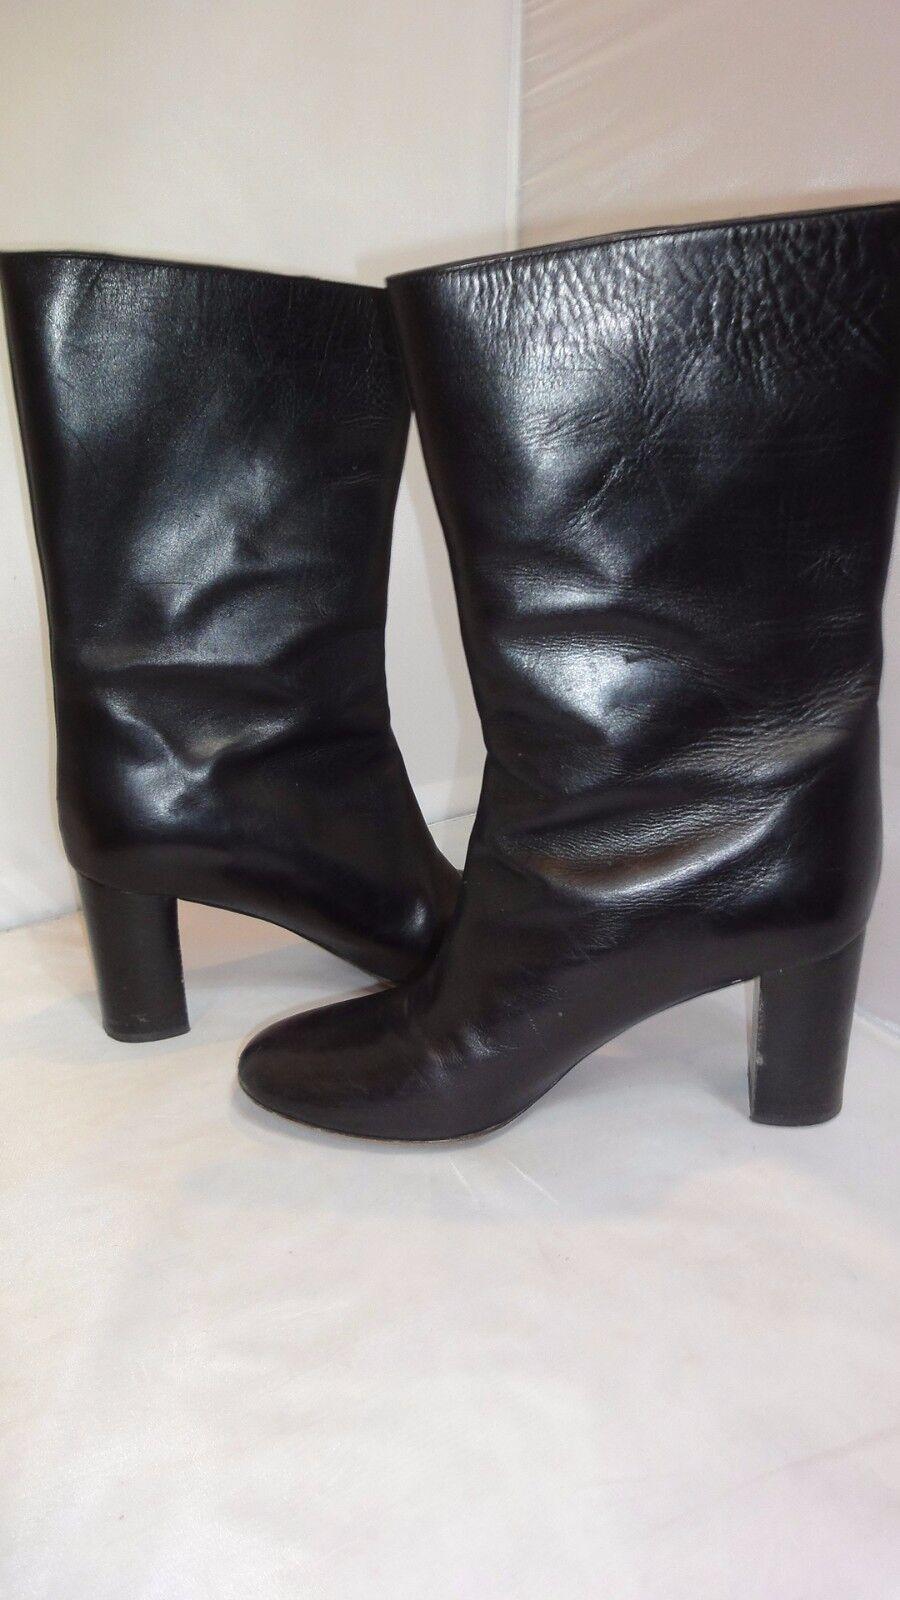 CHLOE Black Mid-Calf Mid-Calf Mid-Calf Black Leather Boots Sz 8.5 a372cf